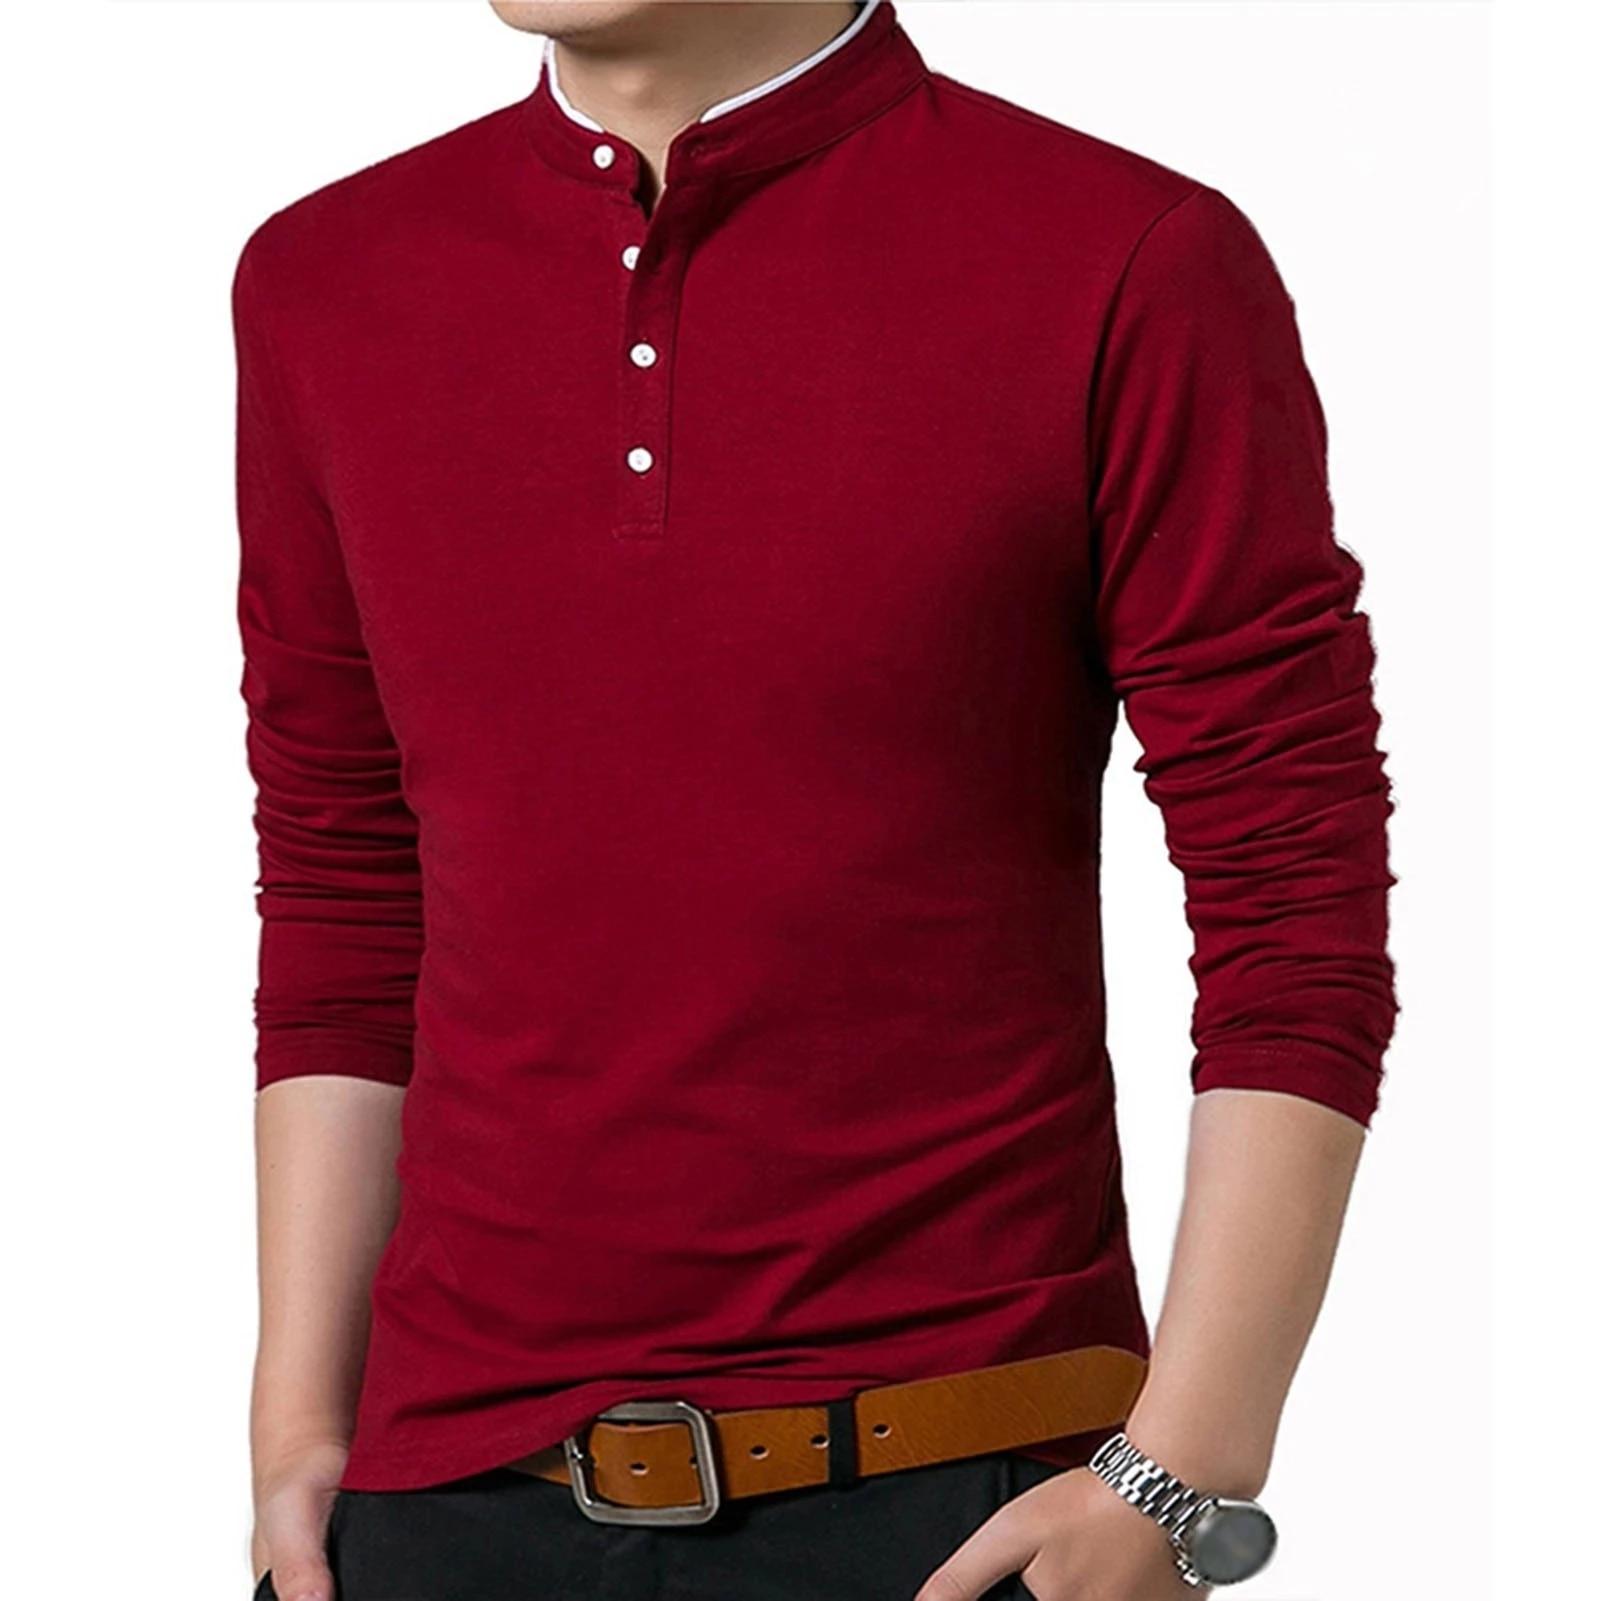 Camiseta دي مانغا corta الفقرة hombre ، camiseta personalizada دي اللون sólido دي algodón بورو دي المانجا larga ، نويفا مودا 2021